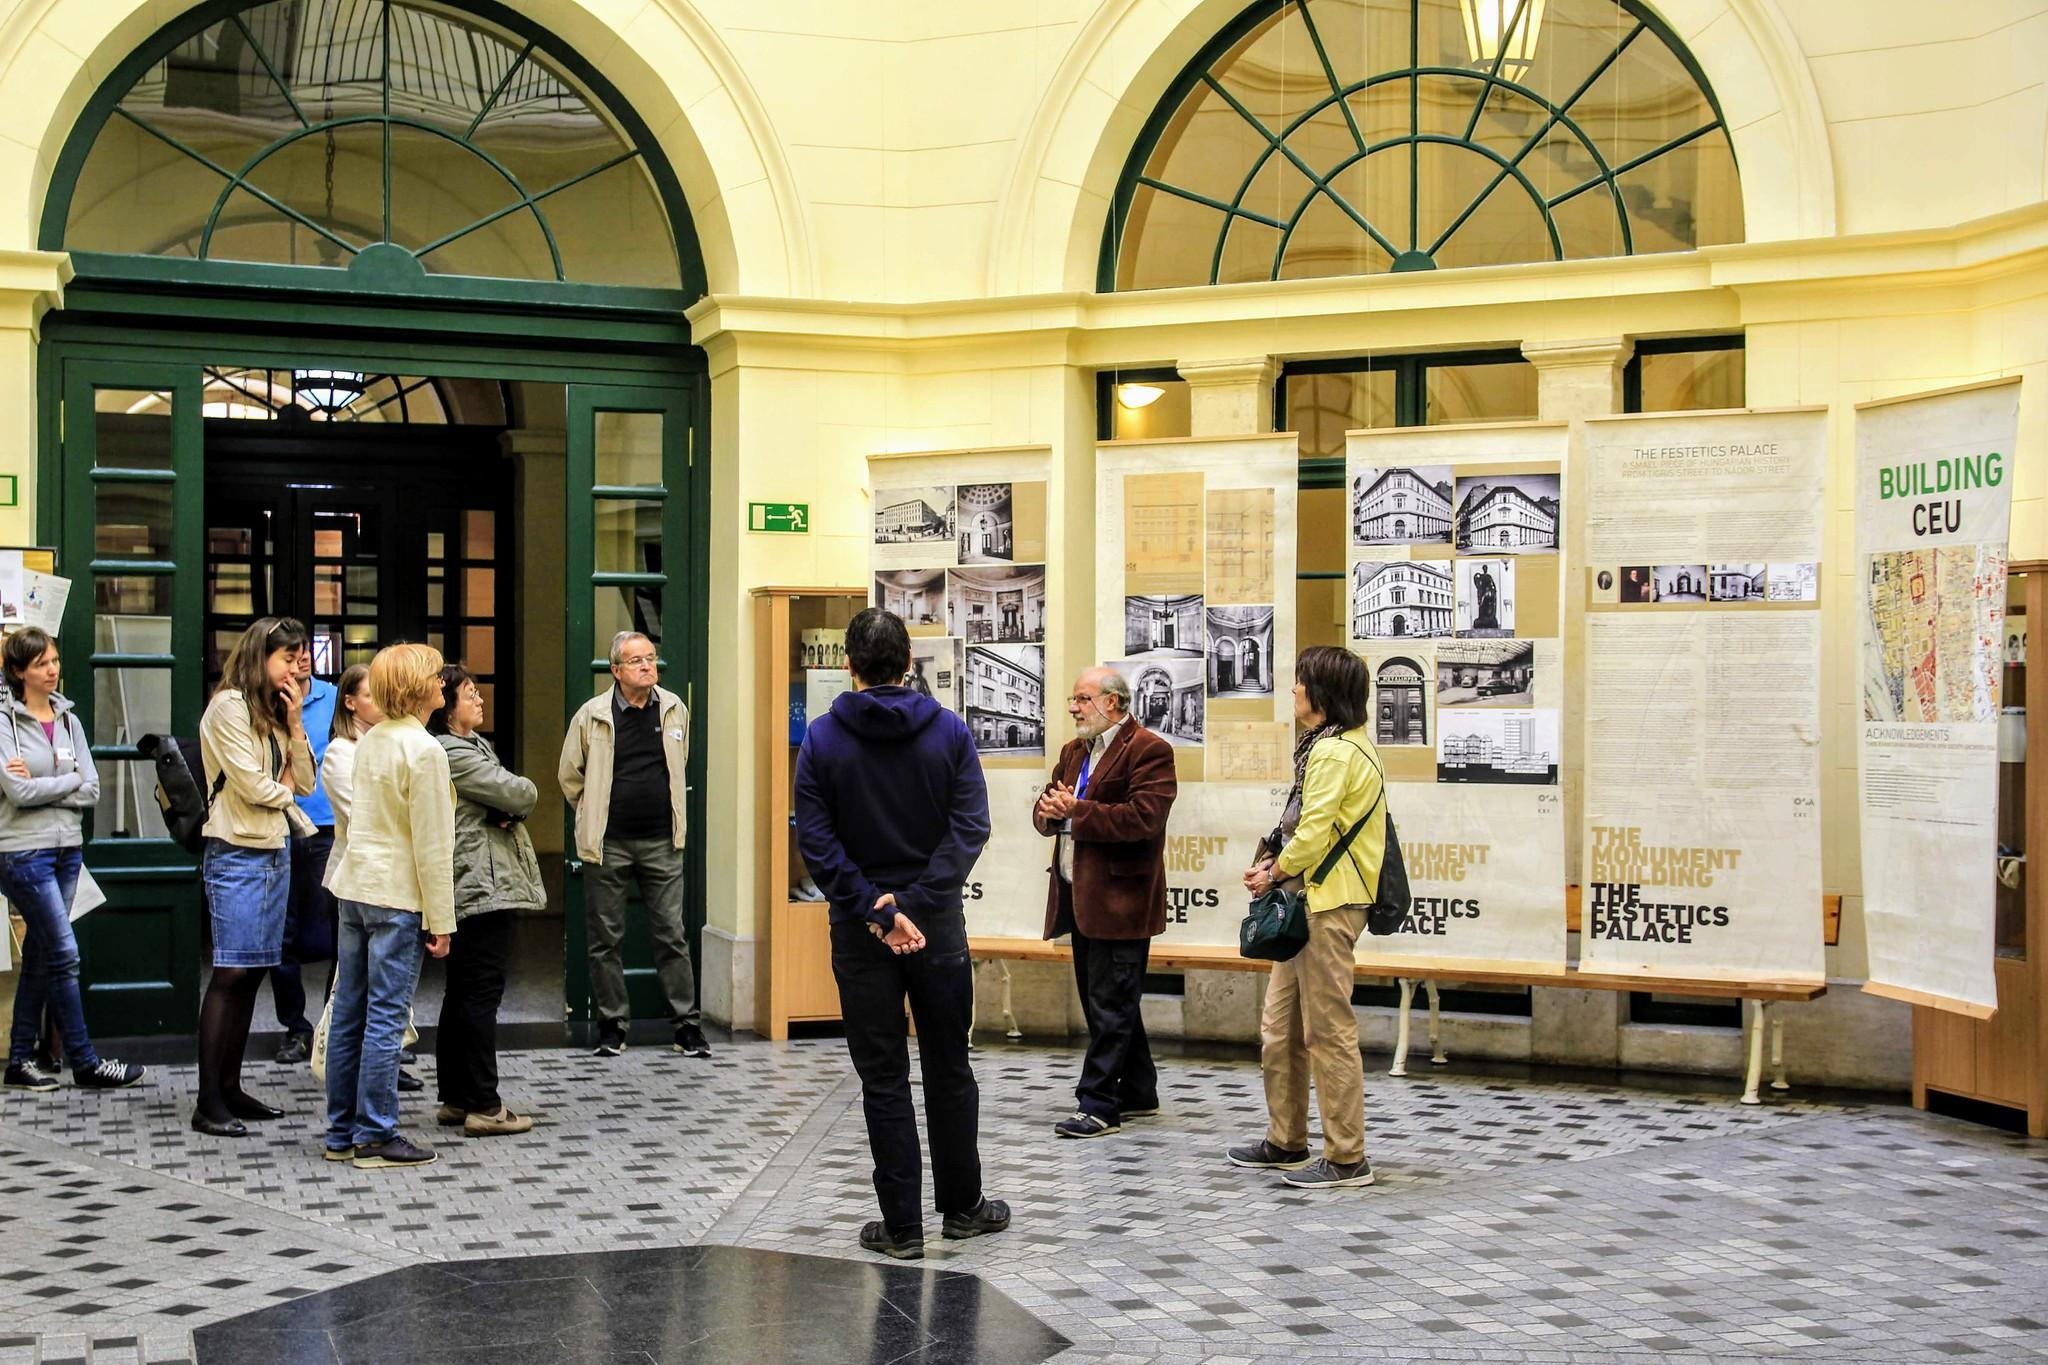 European Heritage Days at CEU – Photos: CEU/ Gulnoza Khasanova & Zsuzsanna Szalka